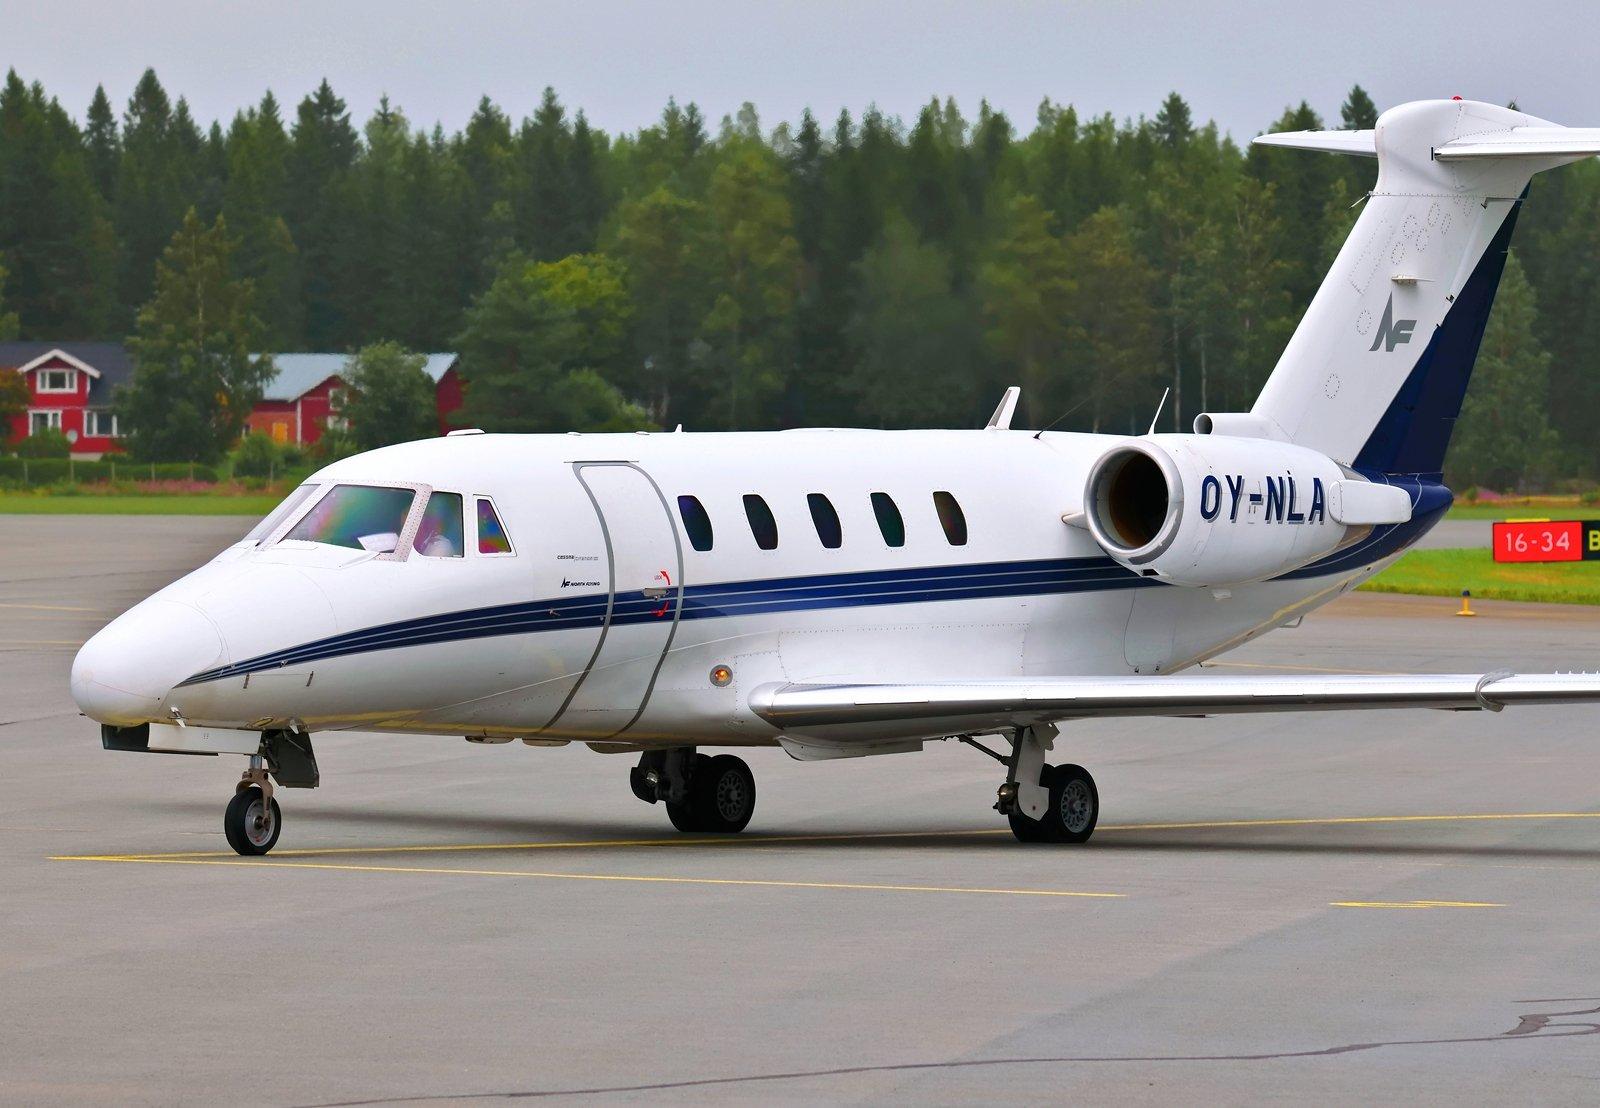 OY-NLA - Cessna 650 Citation III - North Flying - 23.7.2020